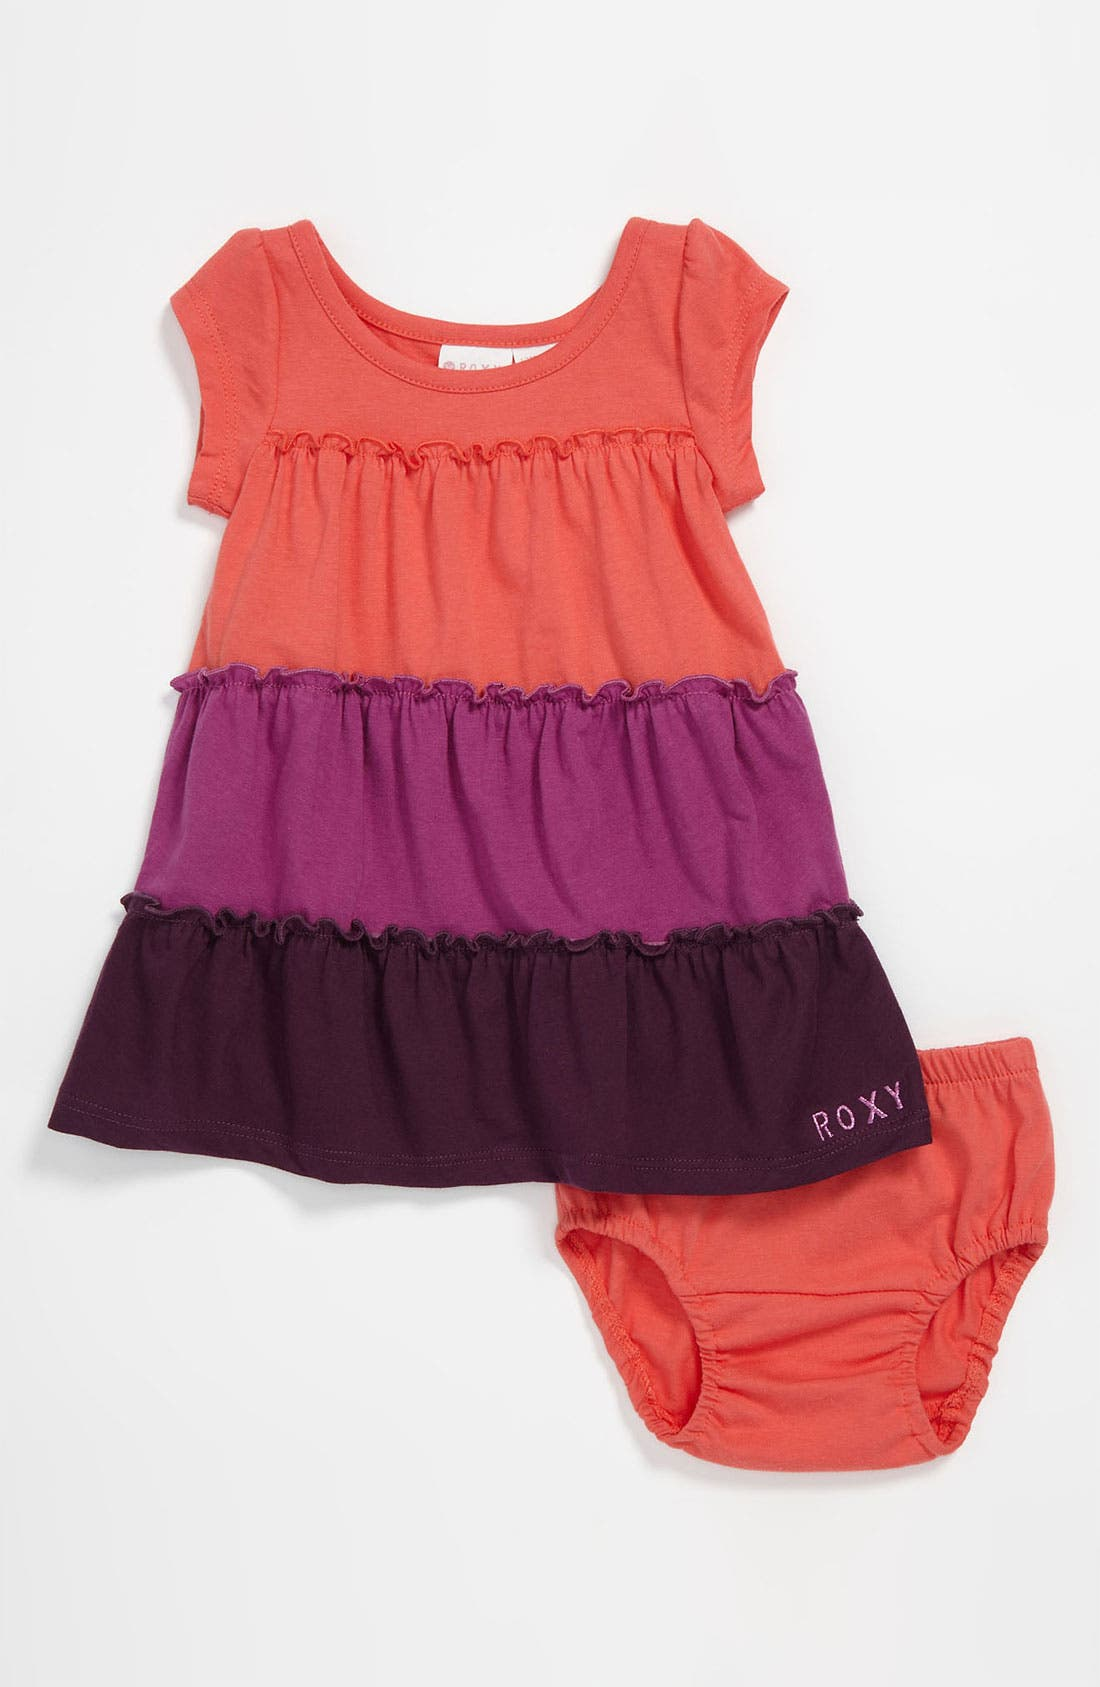 Main Image - Roxy 'Cider' Colorblock Dress (Infant)